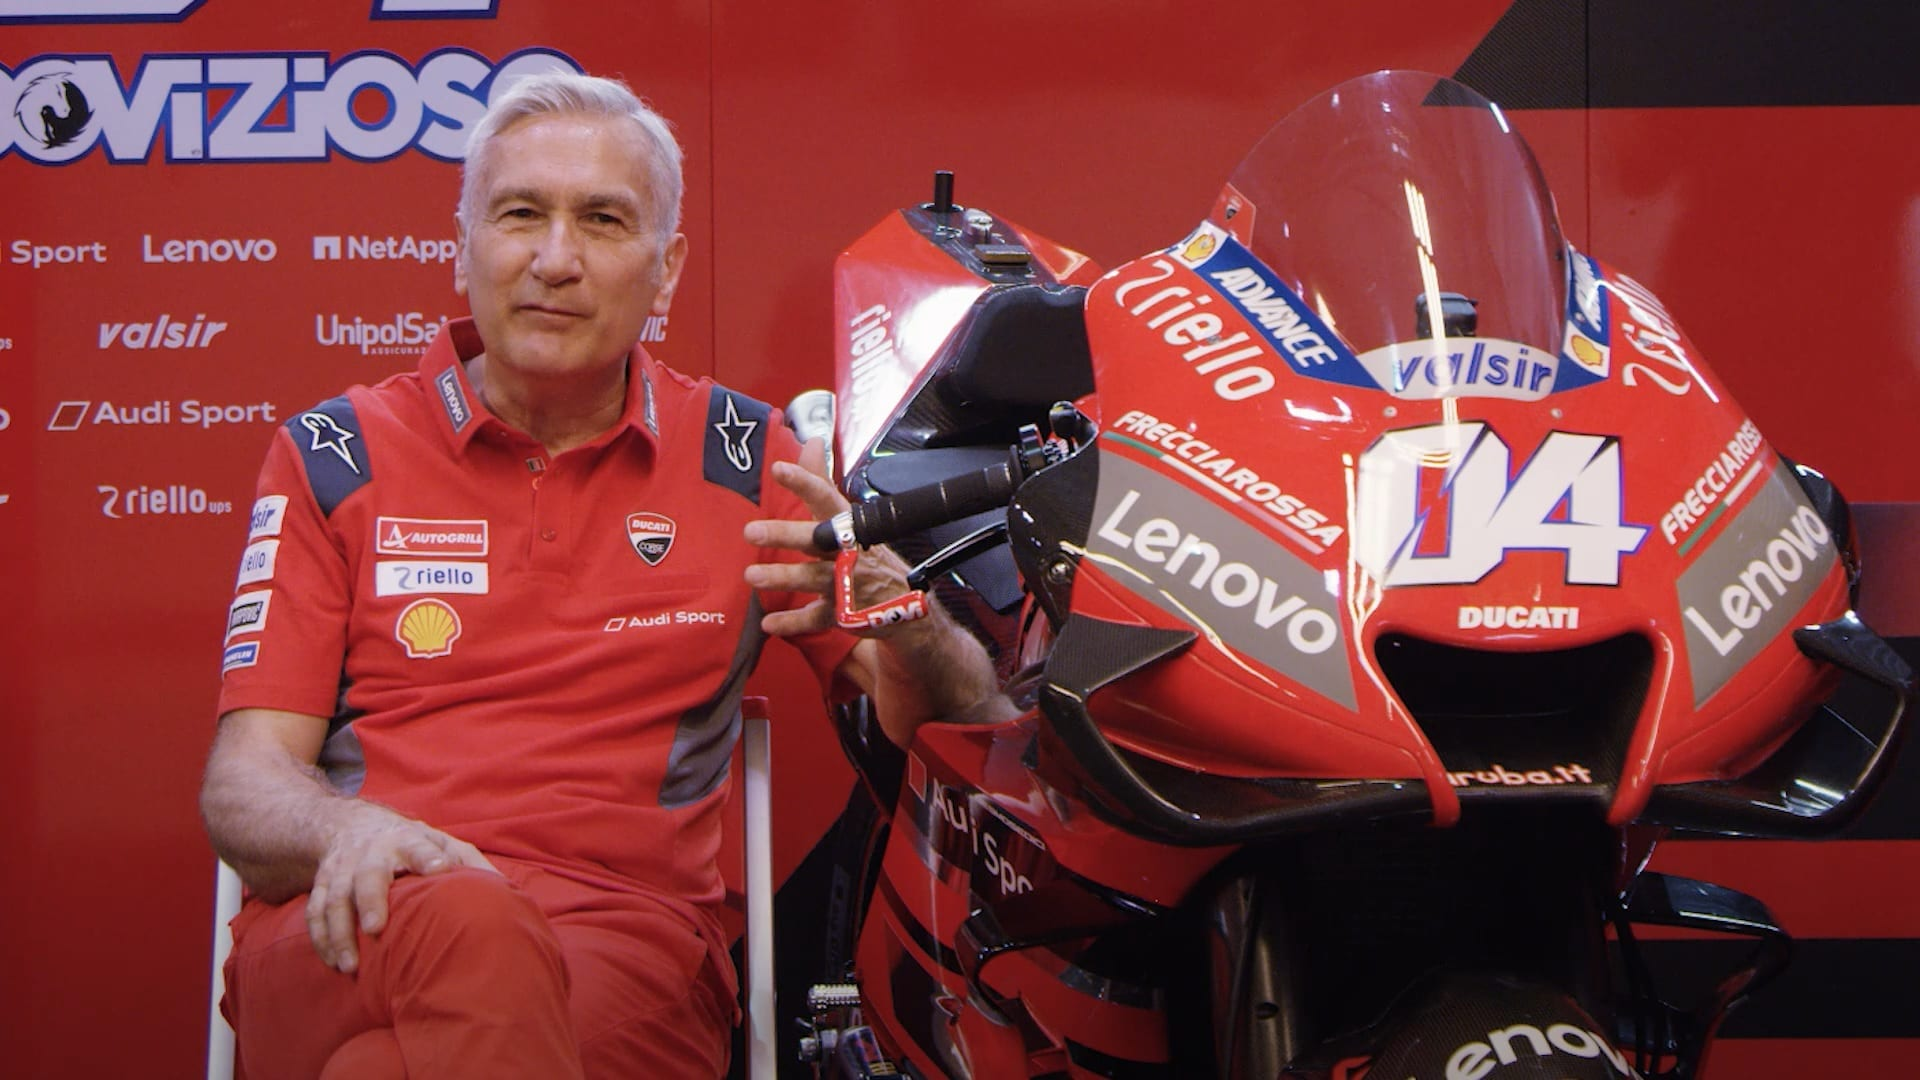 Ducati Team Manager Davide Tardozzi sitting beside a MotoGP bike